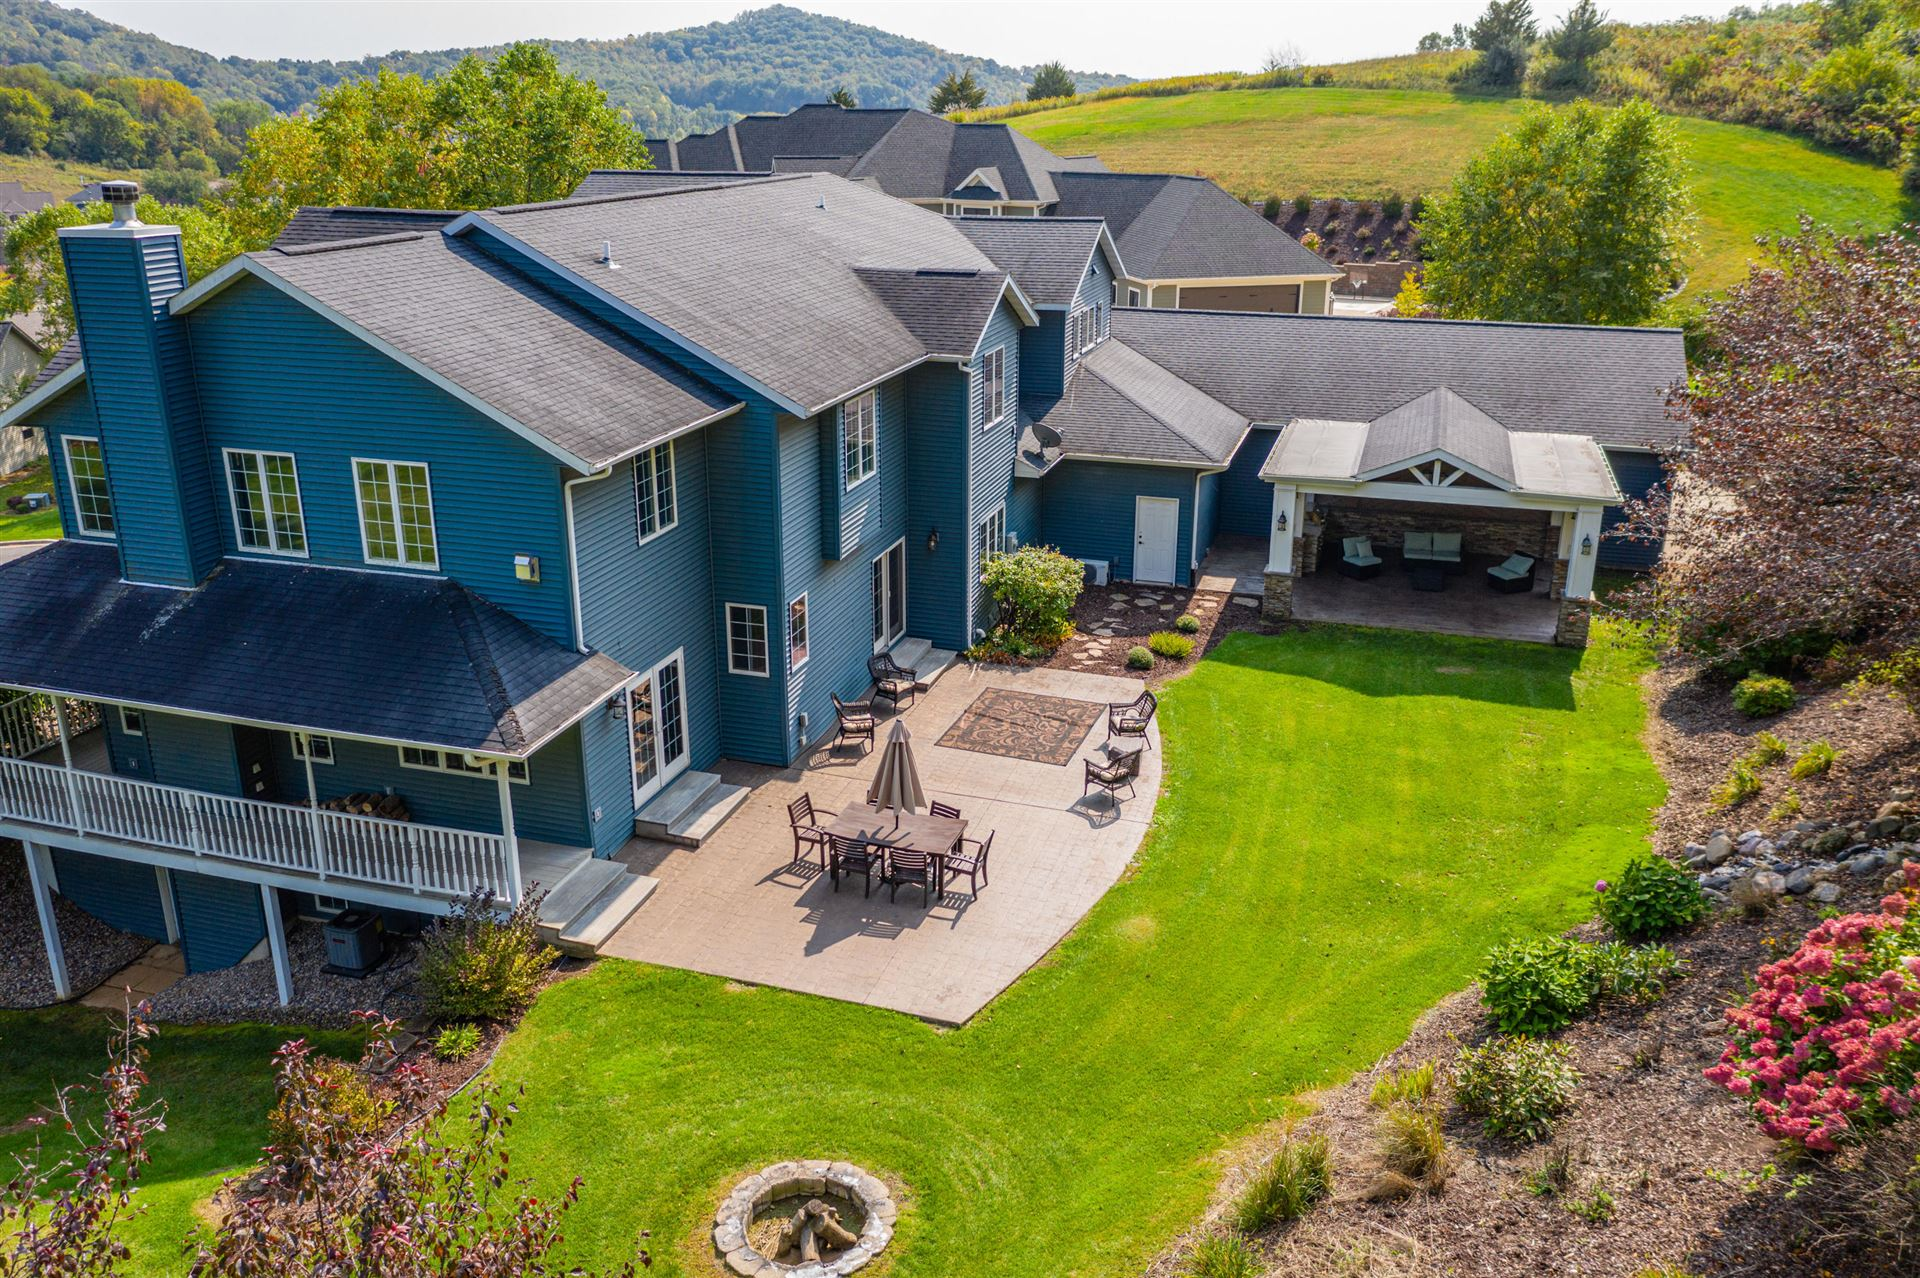 1813 Tahoe Pl, Onalaska, WI 54650 - MLS#: 1712165